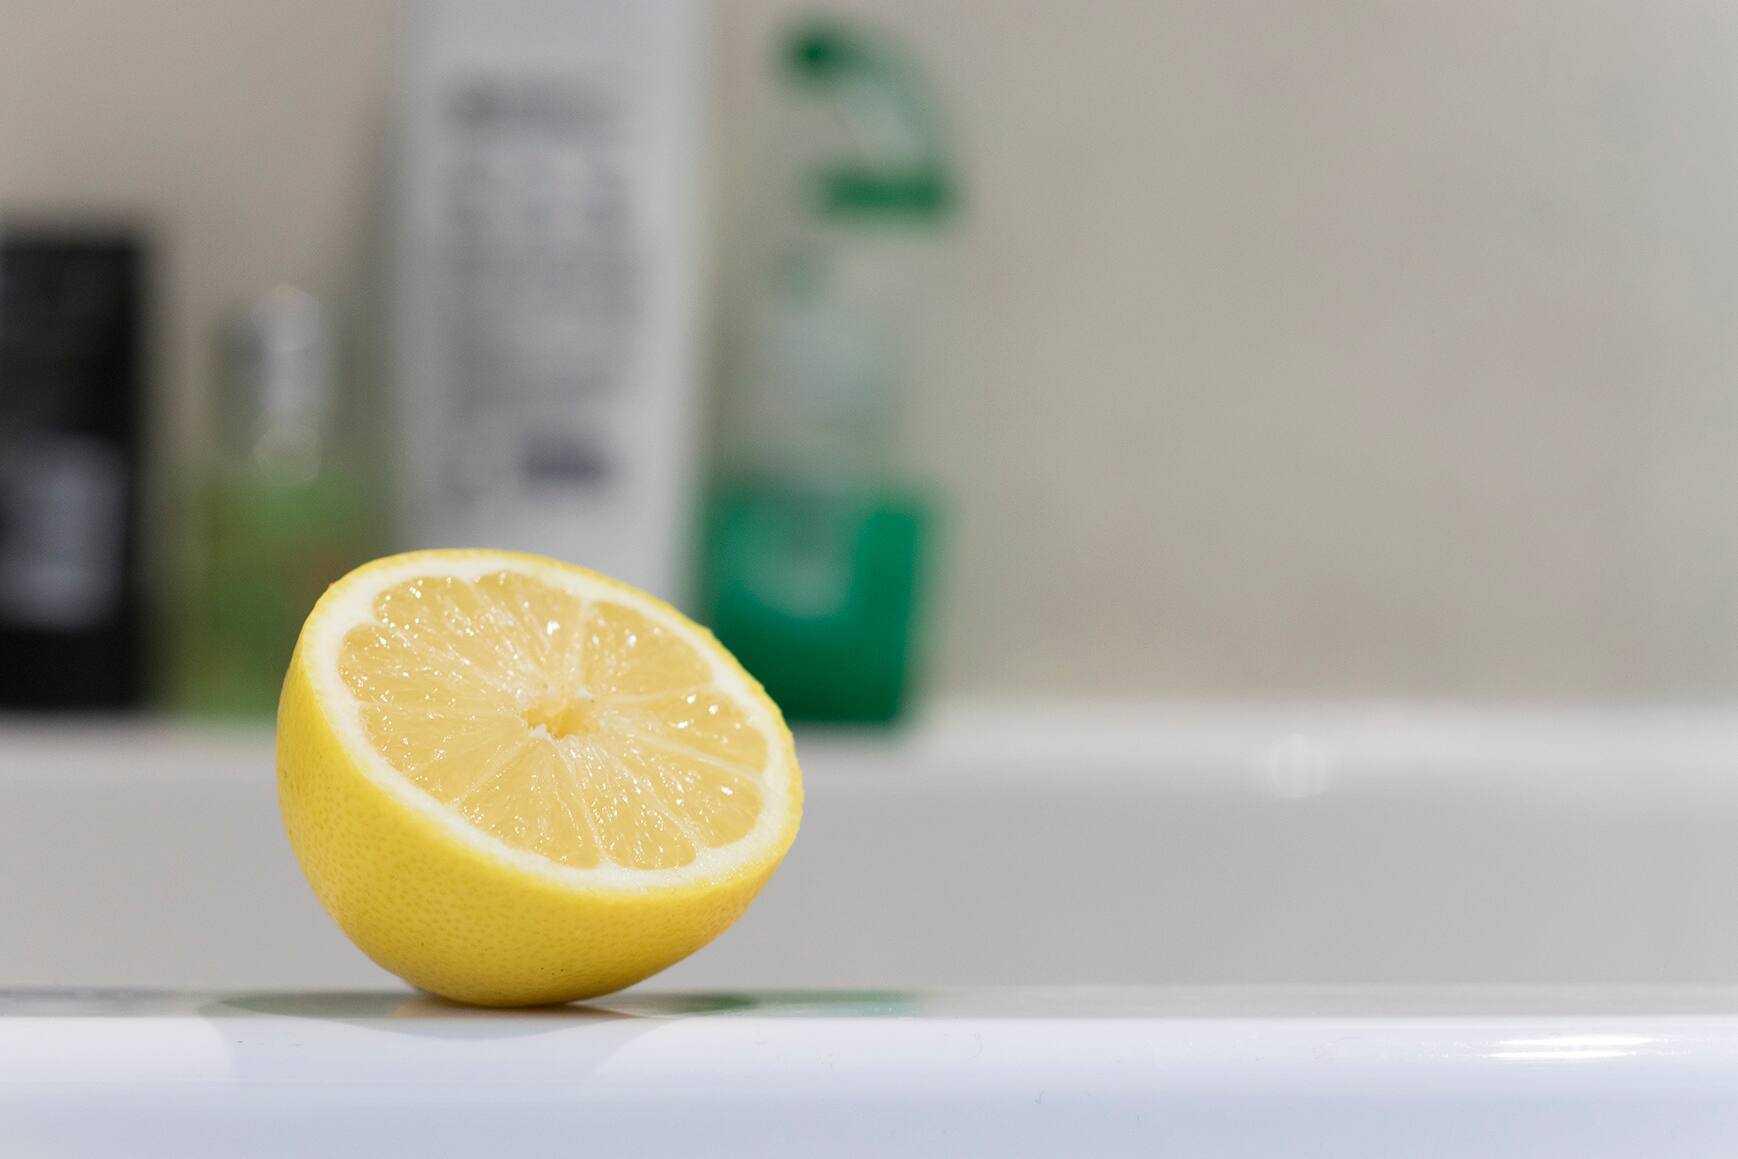 come-sgrassare-mobili-cucina-acciaio-limone